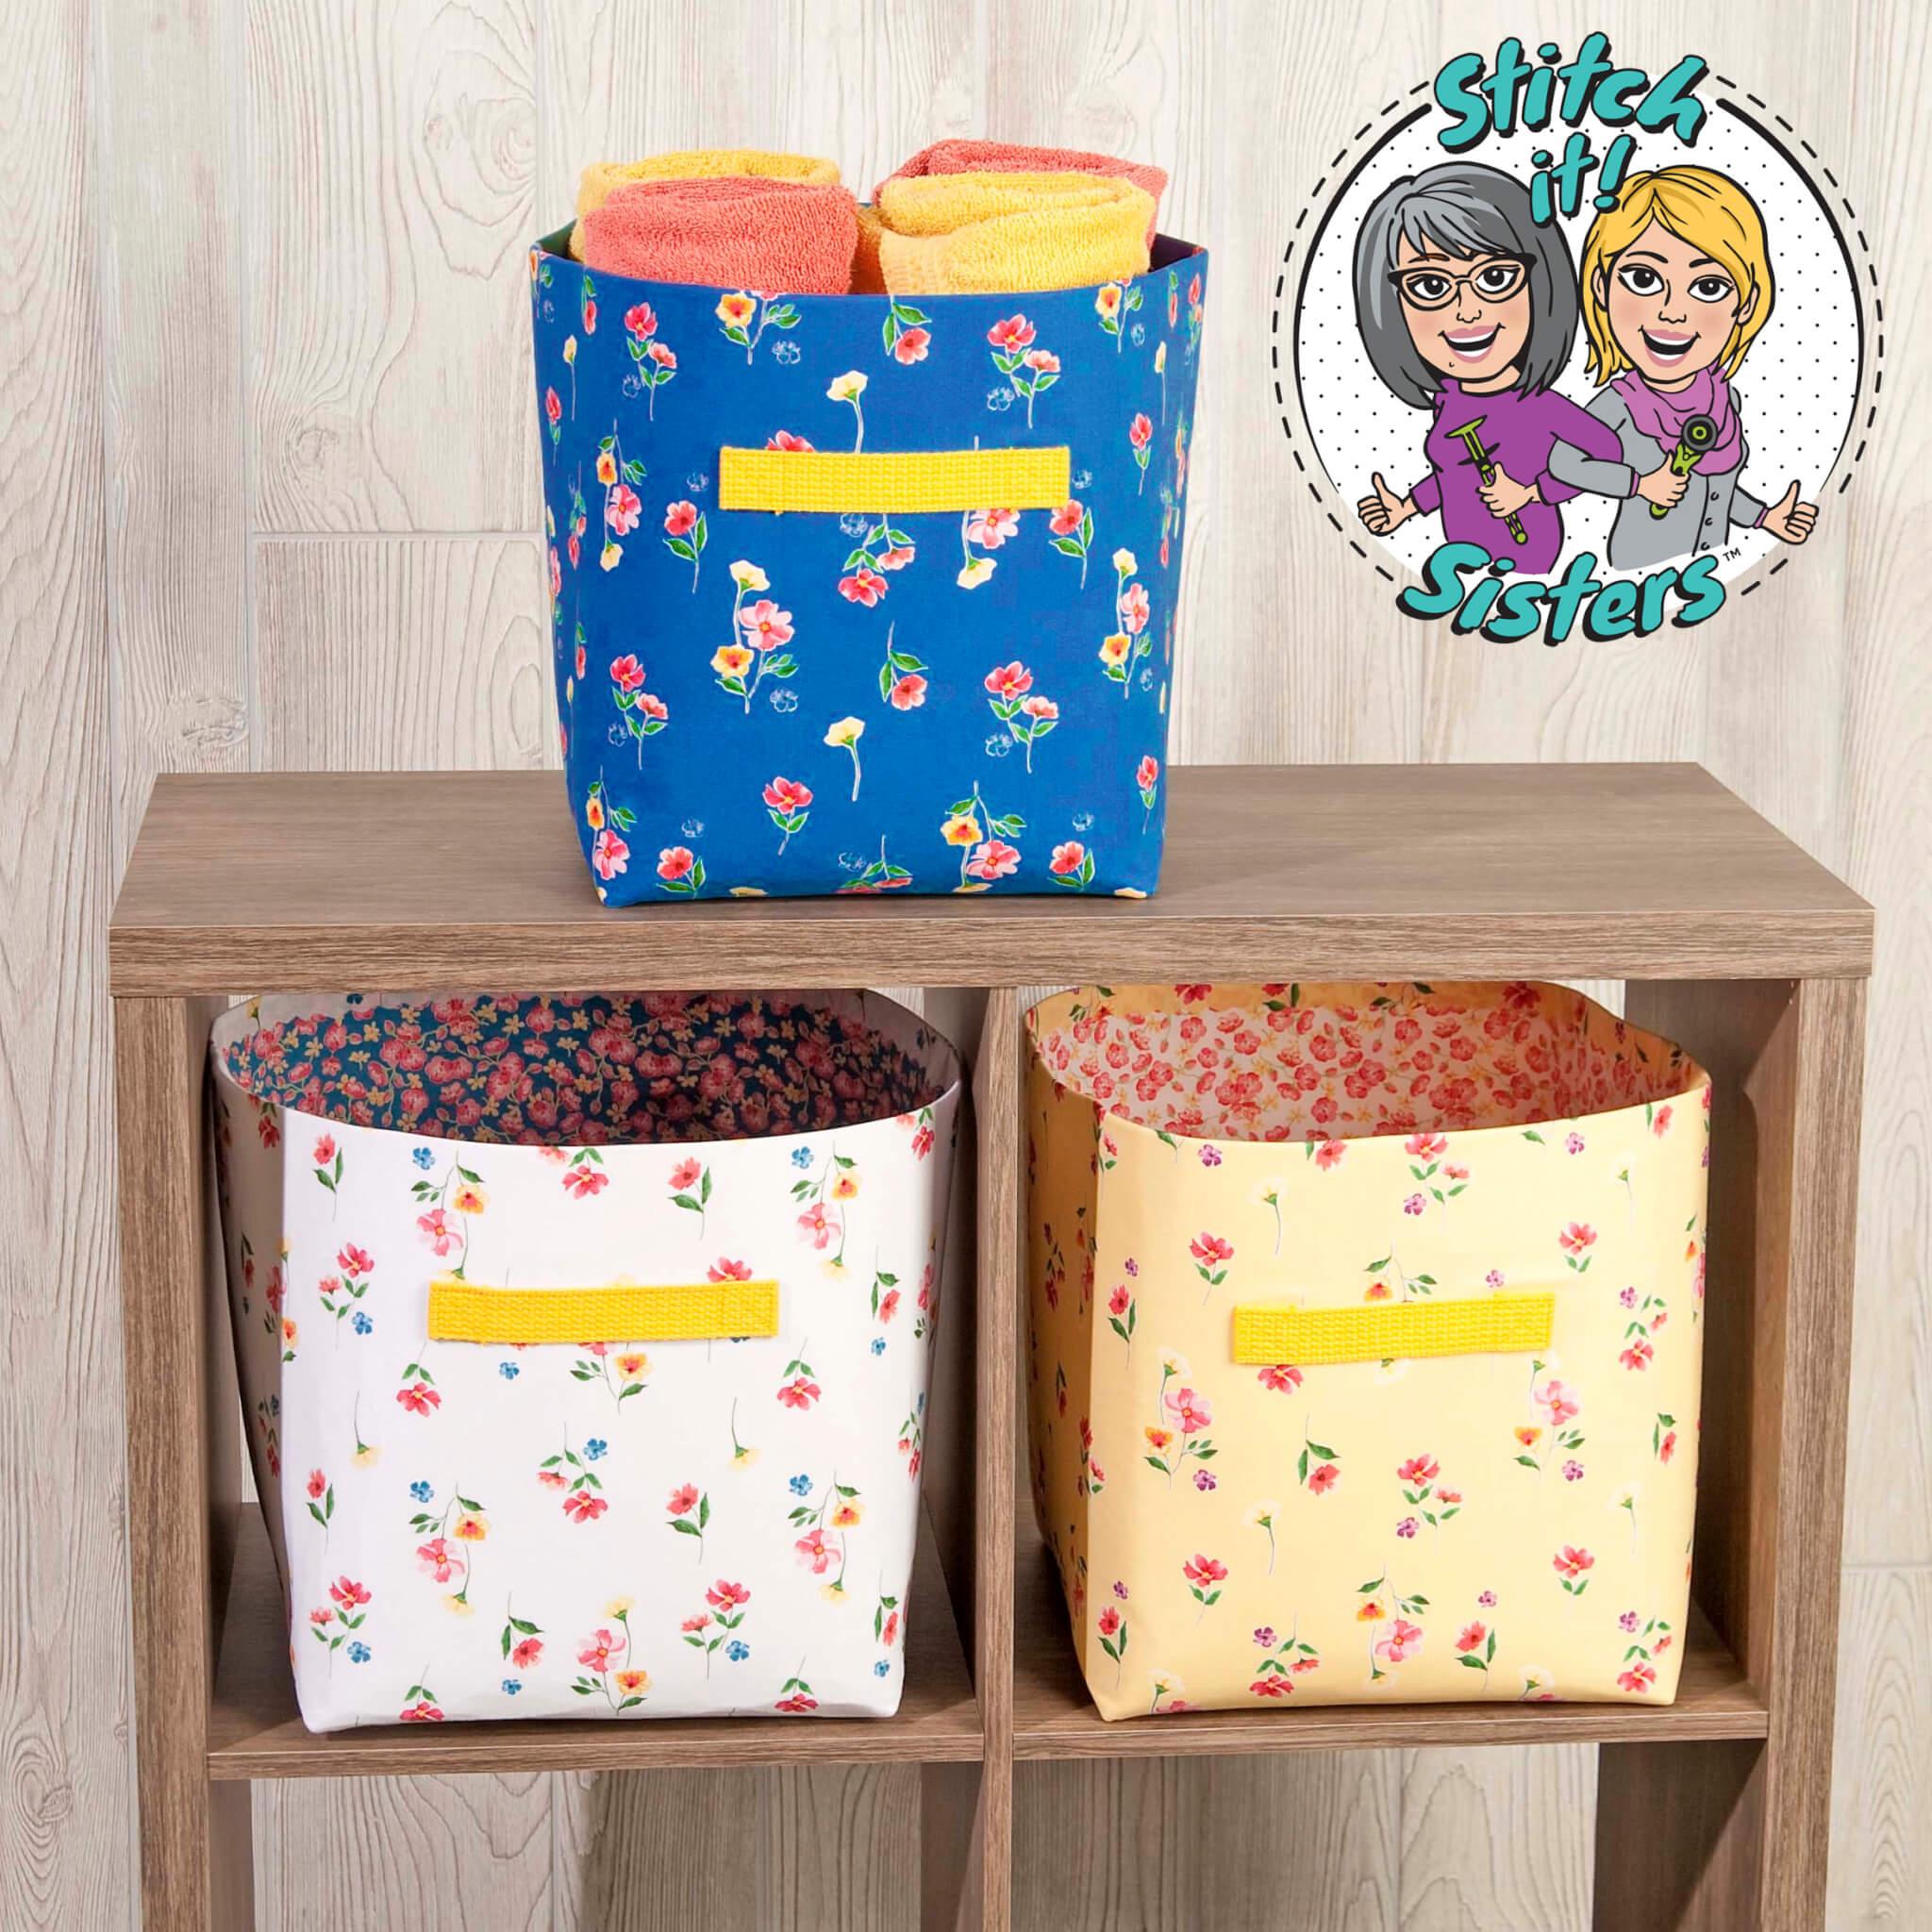 Stitch it! Sisters Sew Organized Fabric Bins Sewing Video Program 203 at The Nancy Zieman Productions Blog